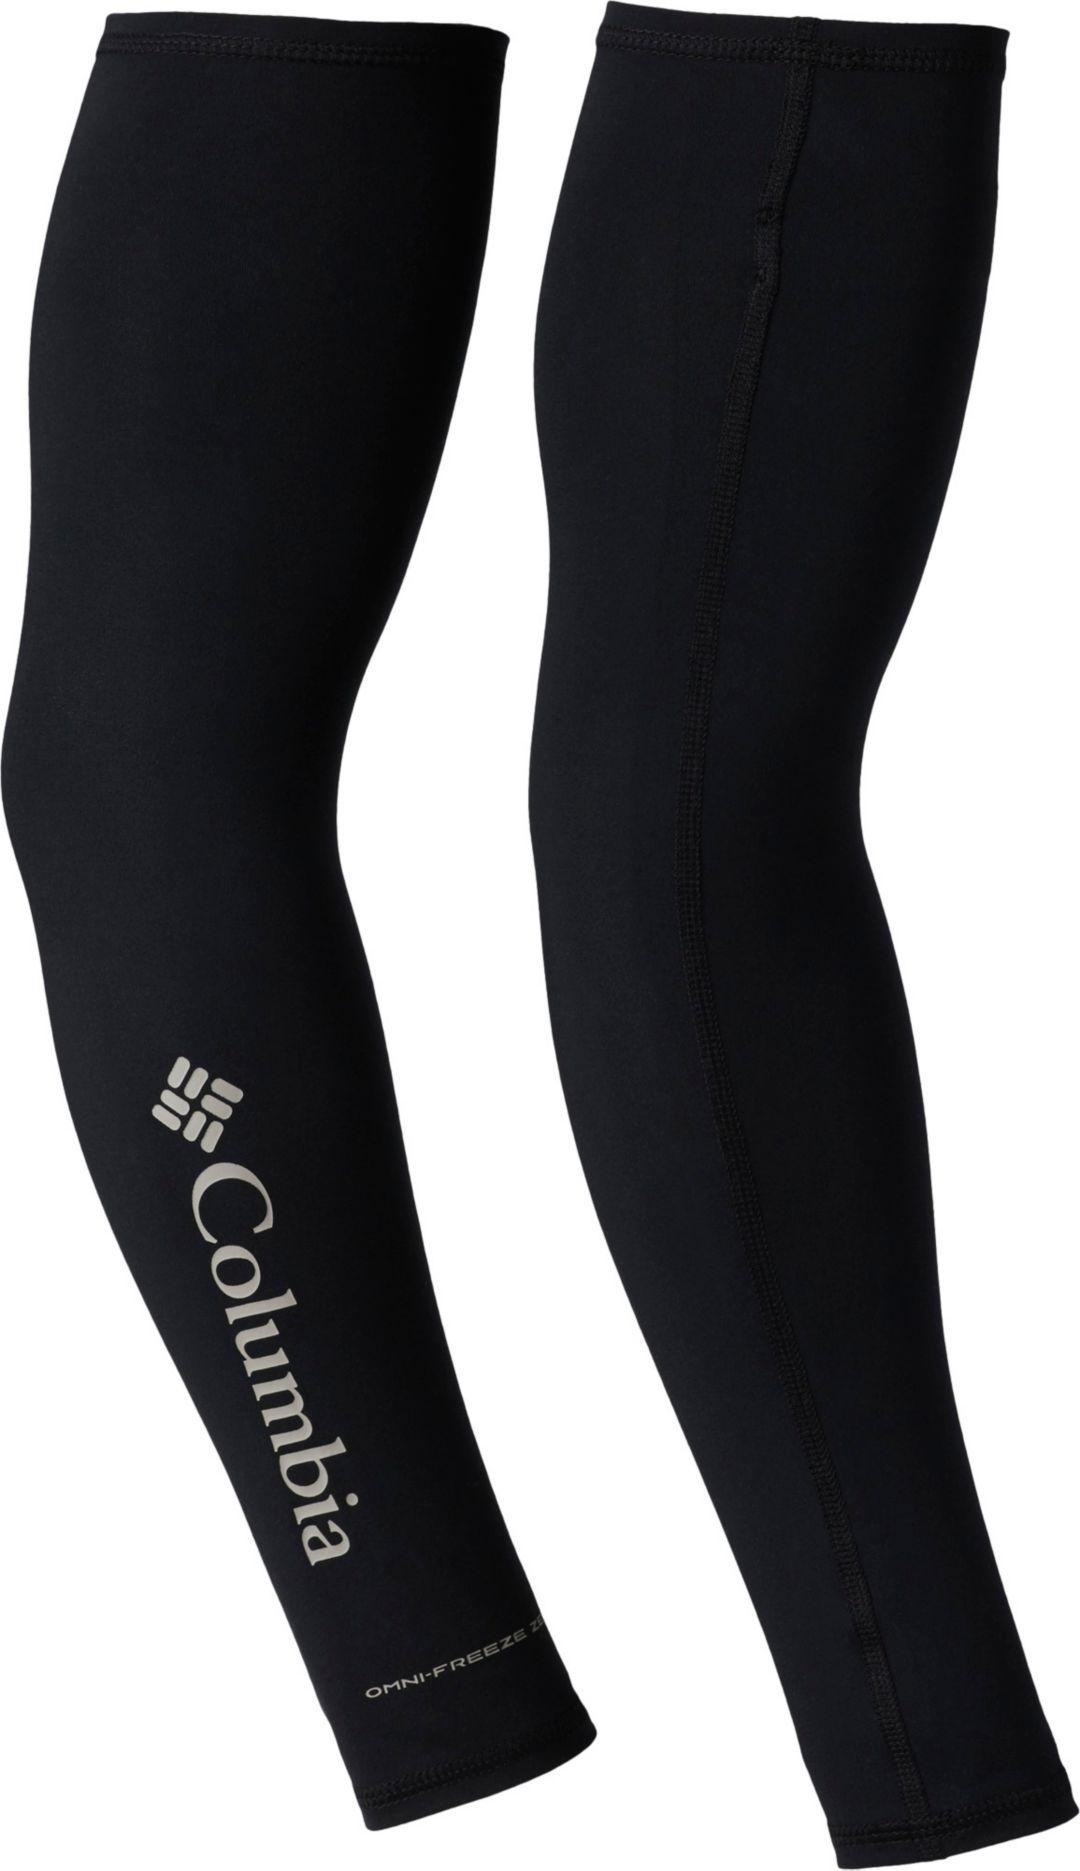 be018dc53a3 Columbia Freezer Zero Arm Sleeve | DICK'S Sporting Goods